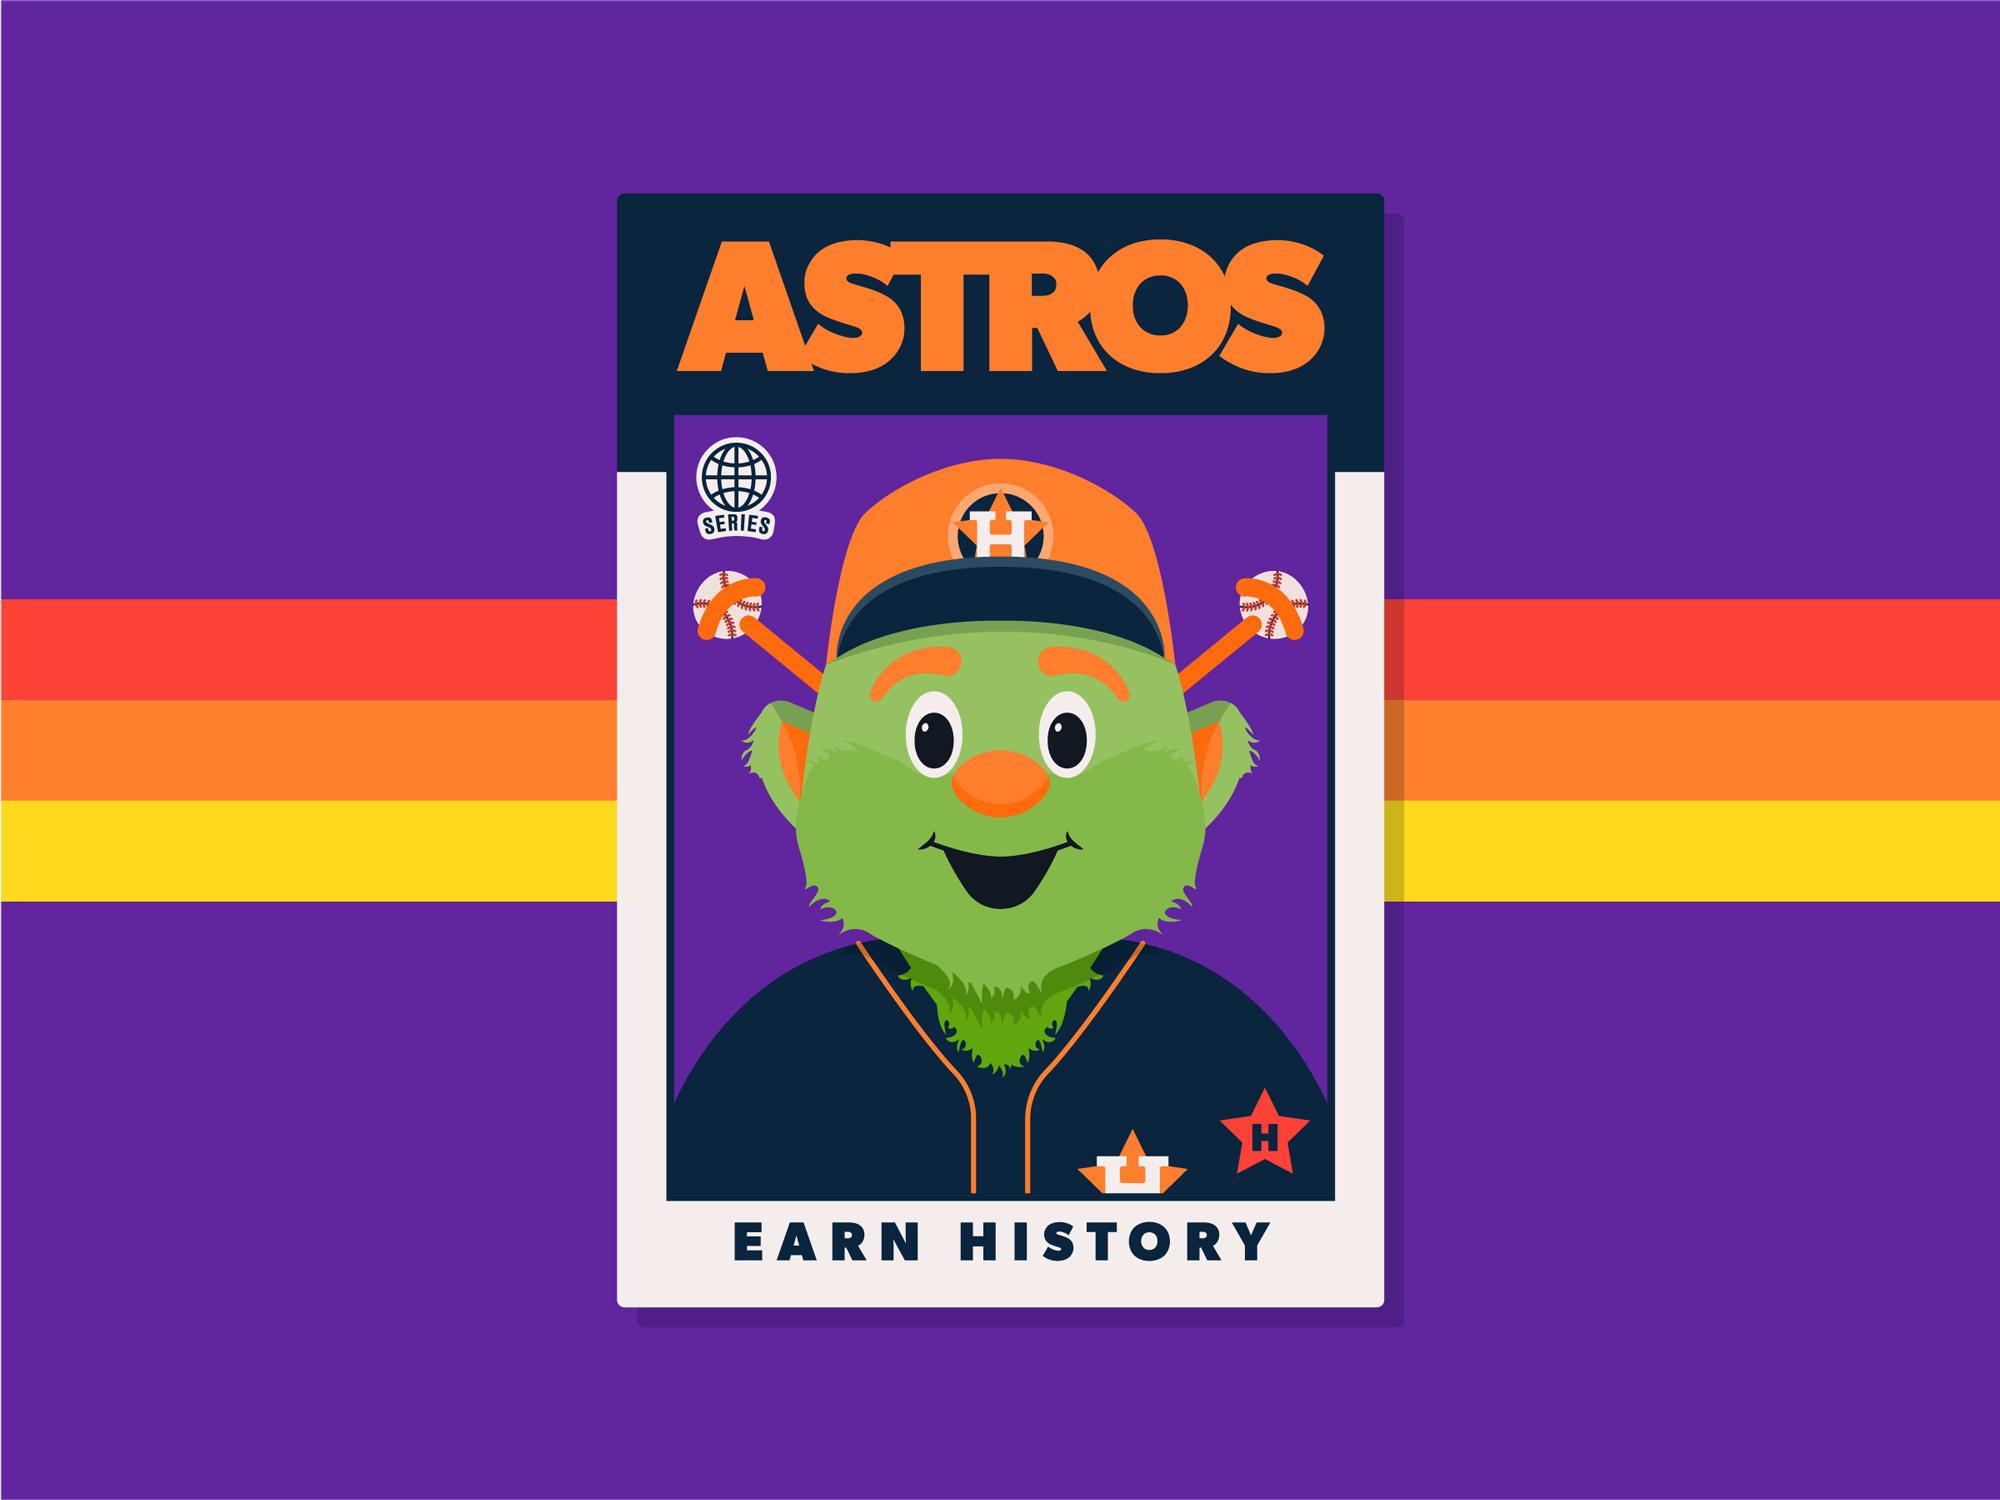 Astros_04.jpg